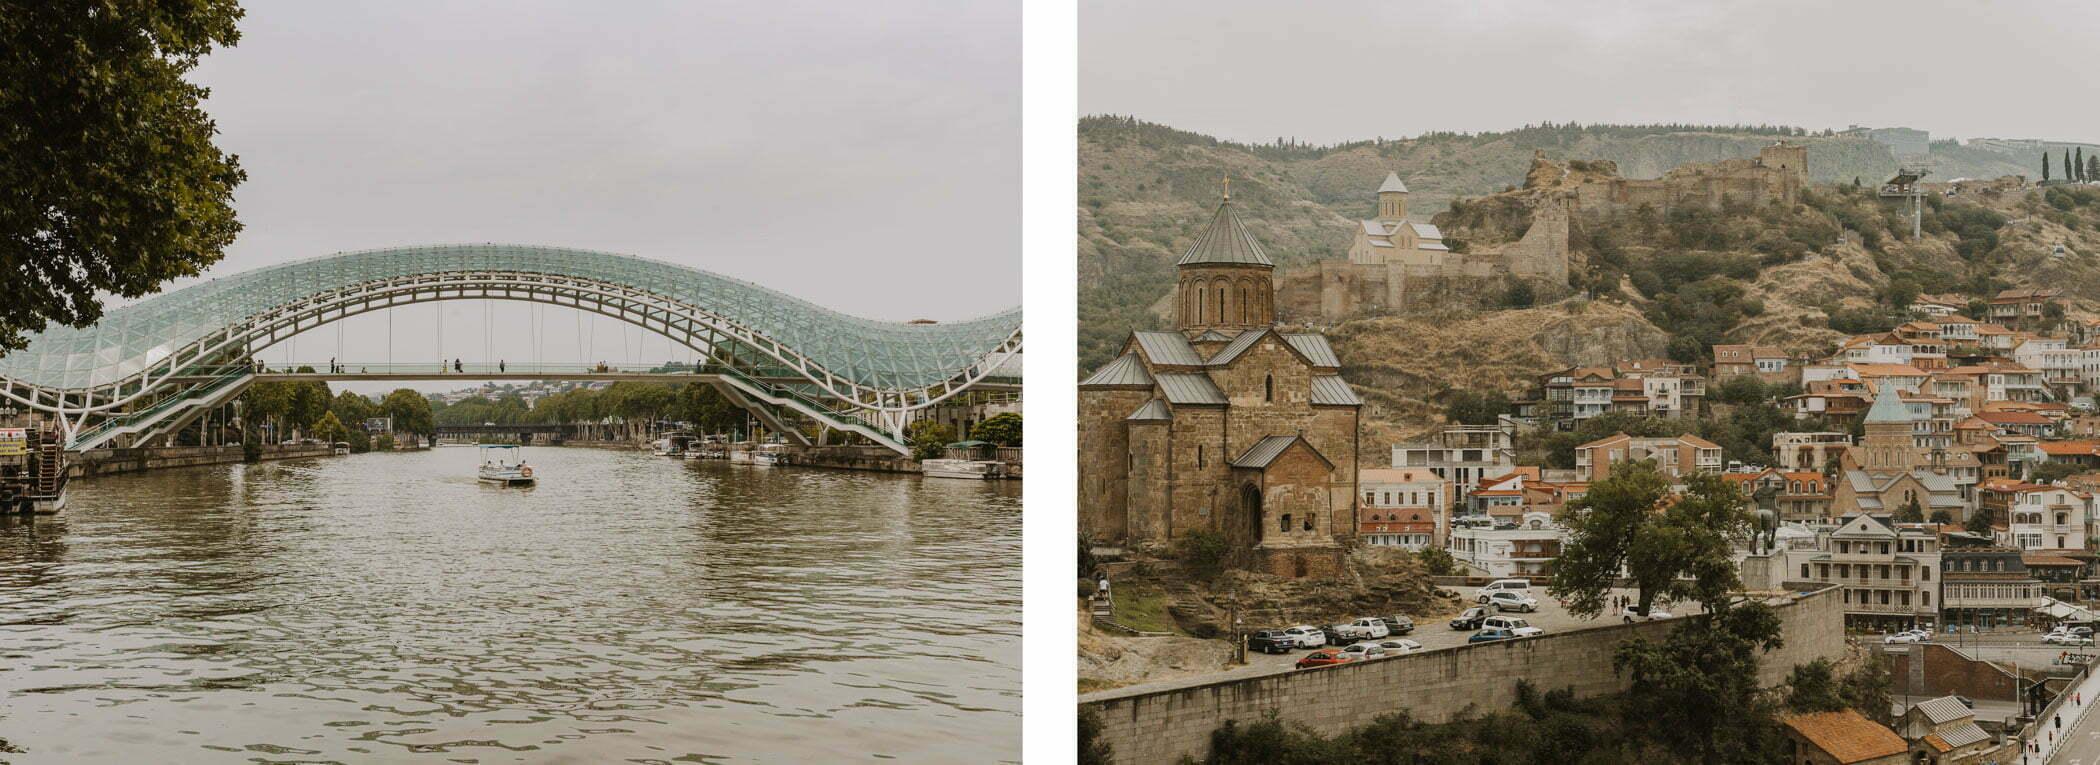 Tbilisi - Most Pokoju